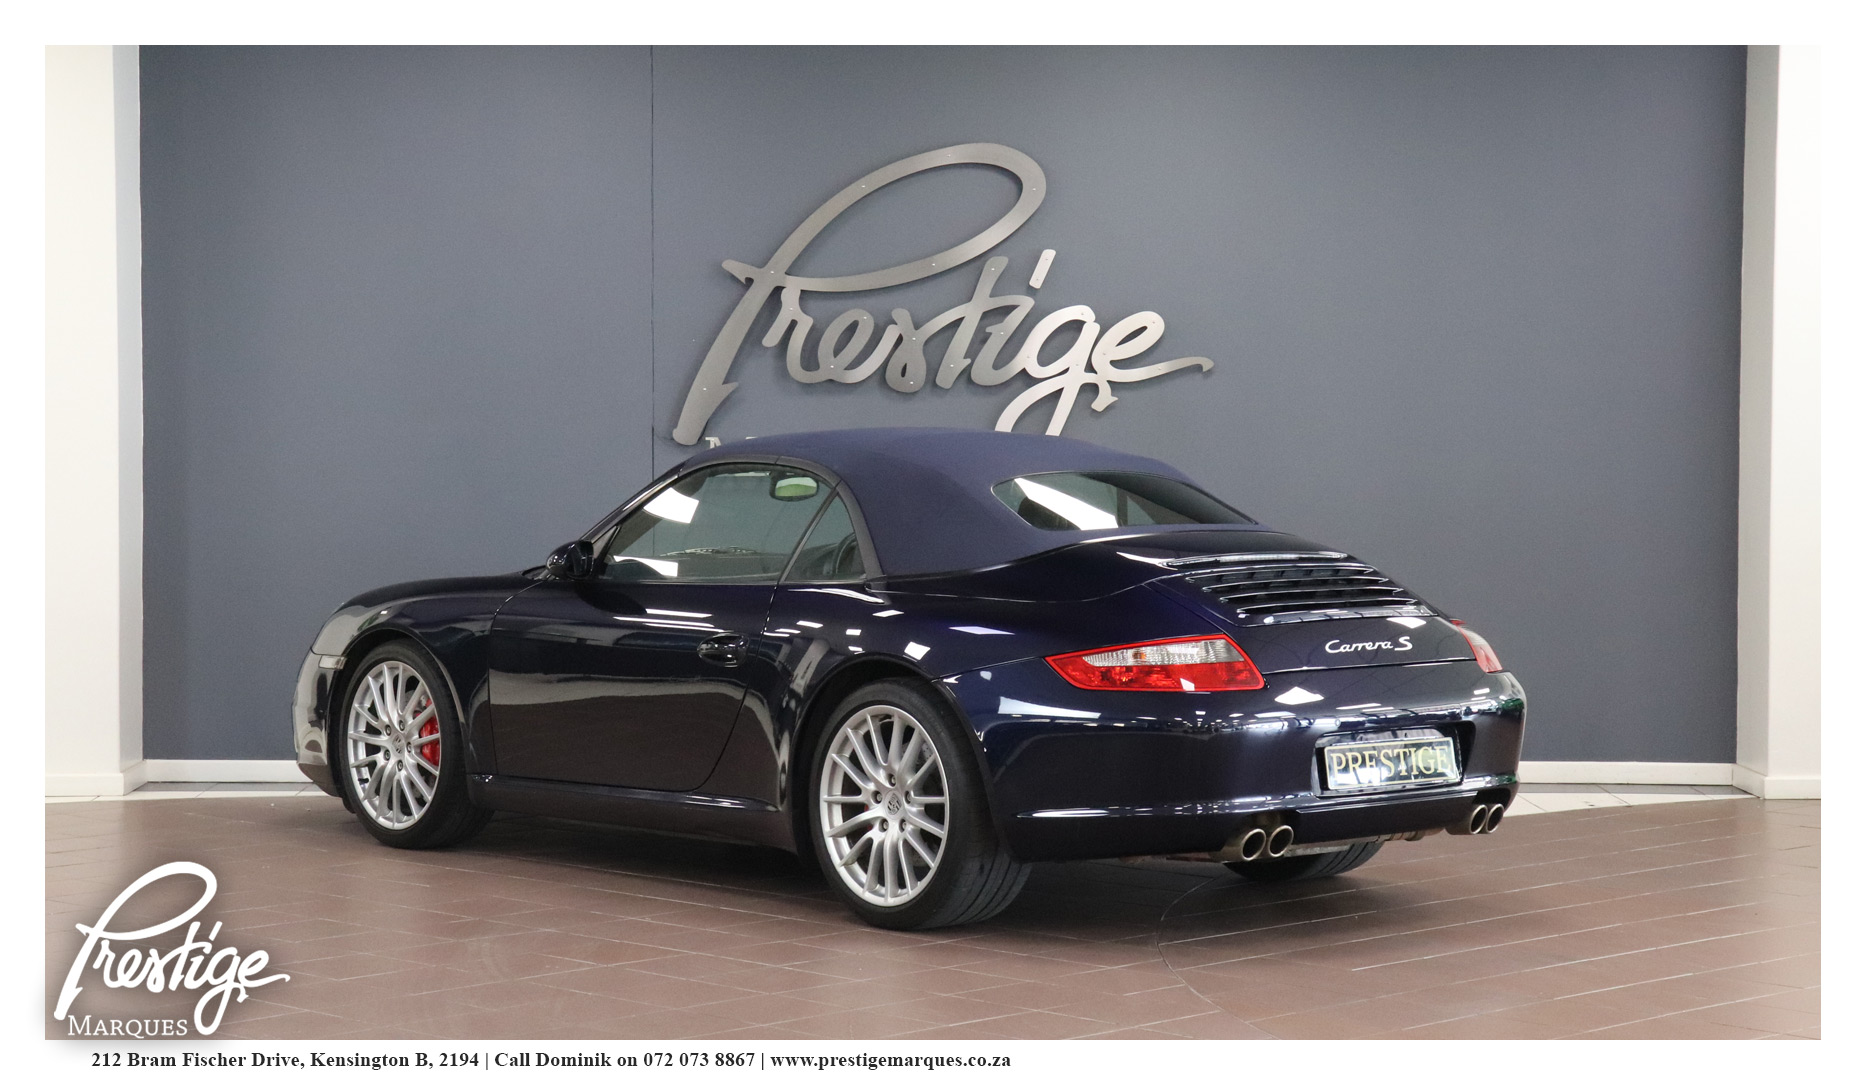 2005-Porsche-911-997-Carrera-S-Cabriolet-Tiptronic-Prestige-Marques-Randburg-Sandton-9